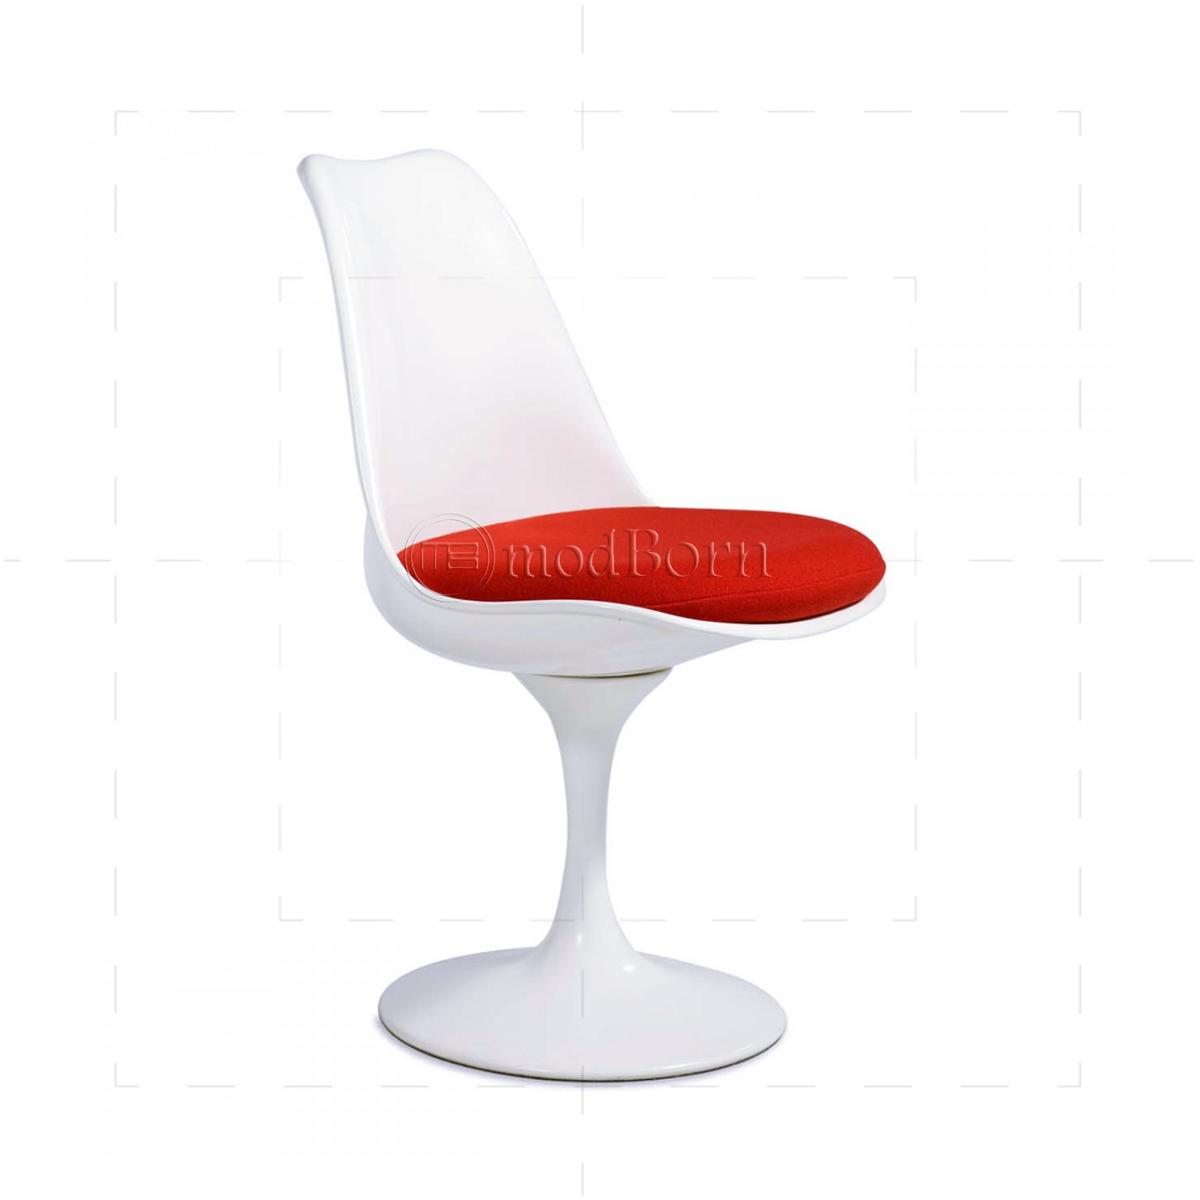 Eero saarinen tulip chair replica american hwy - Tulip chair replica ...